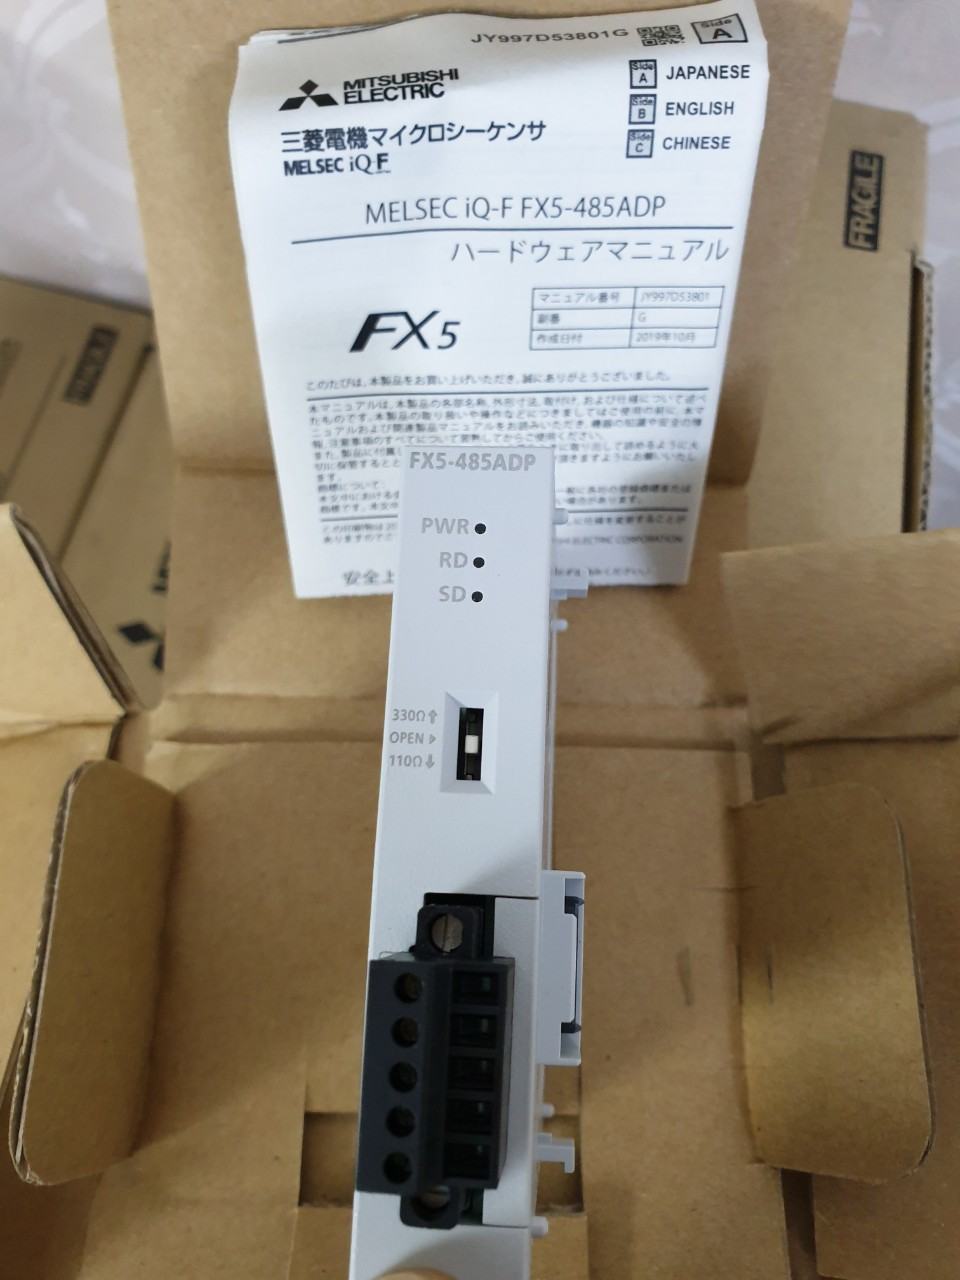 FX5-485ADP